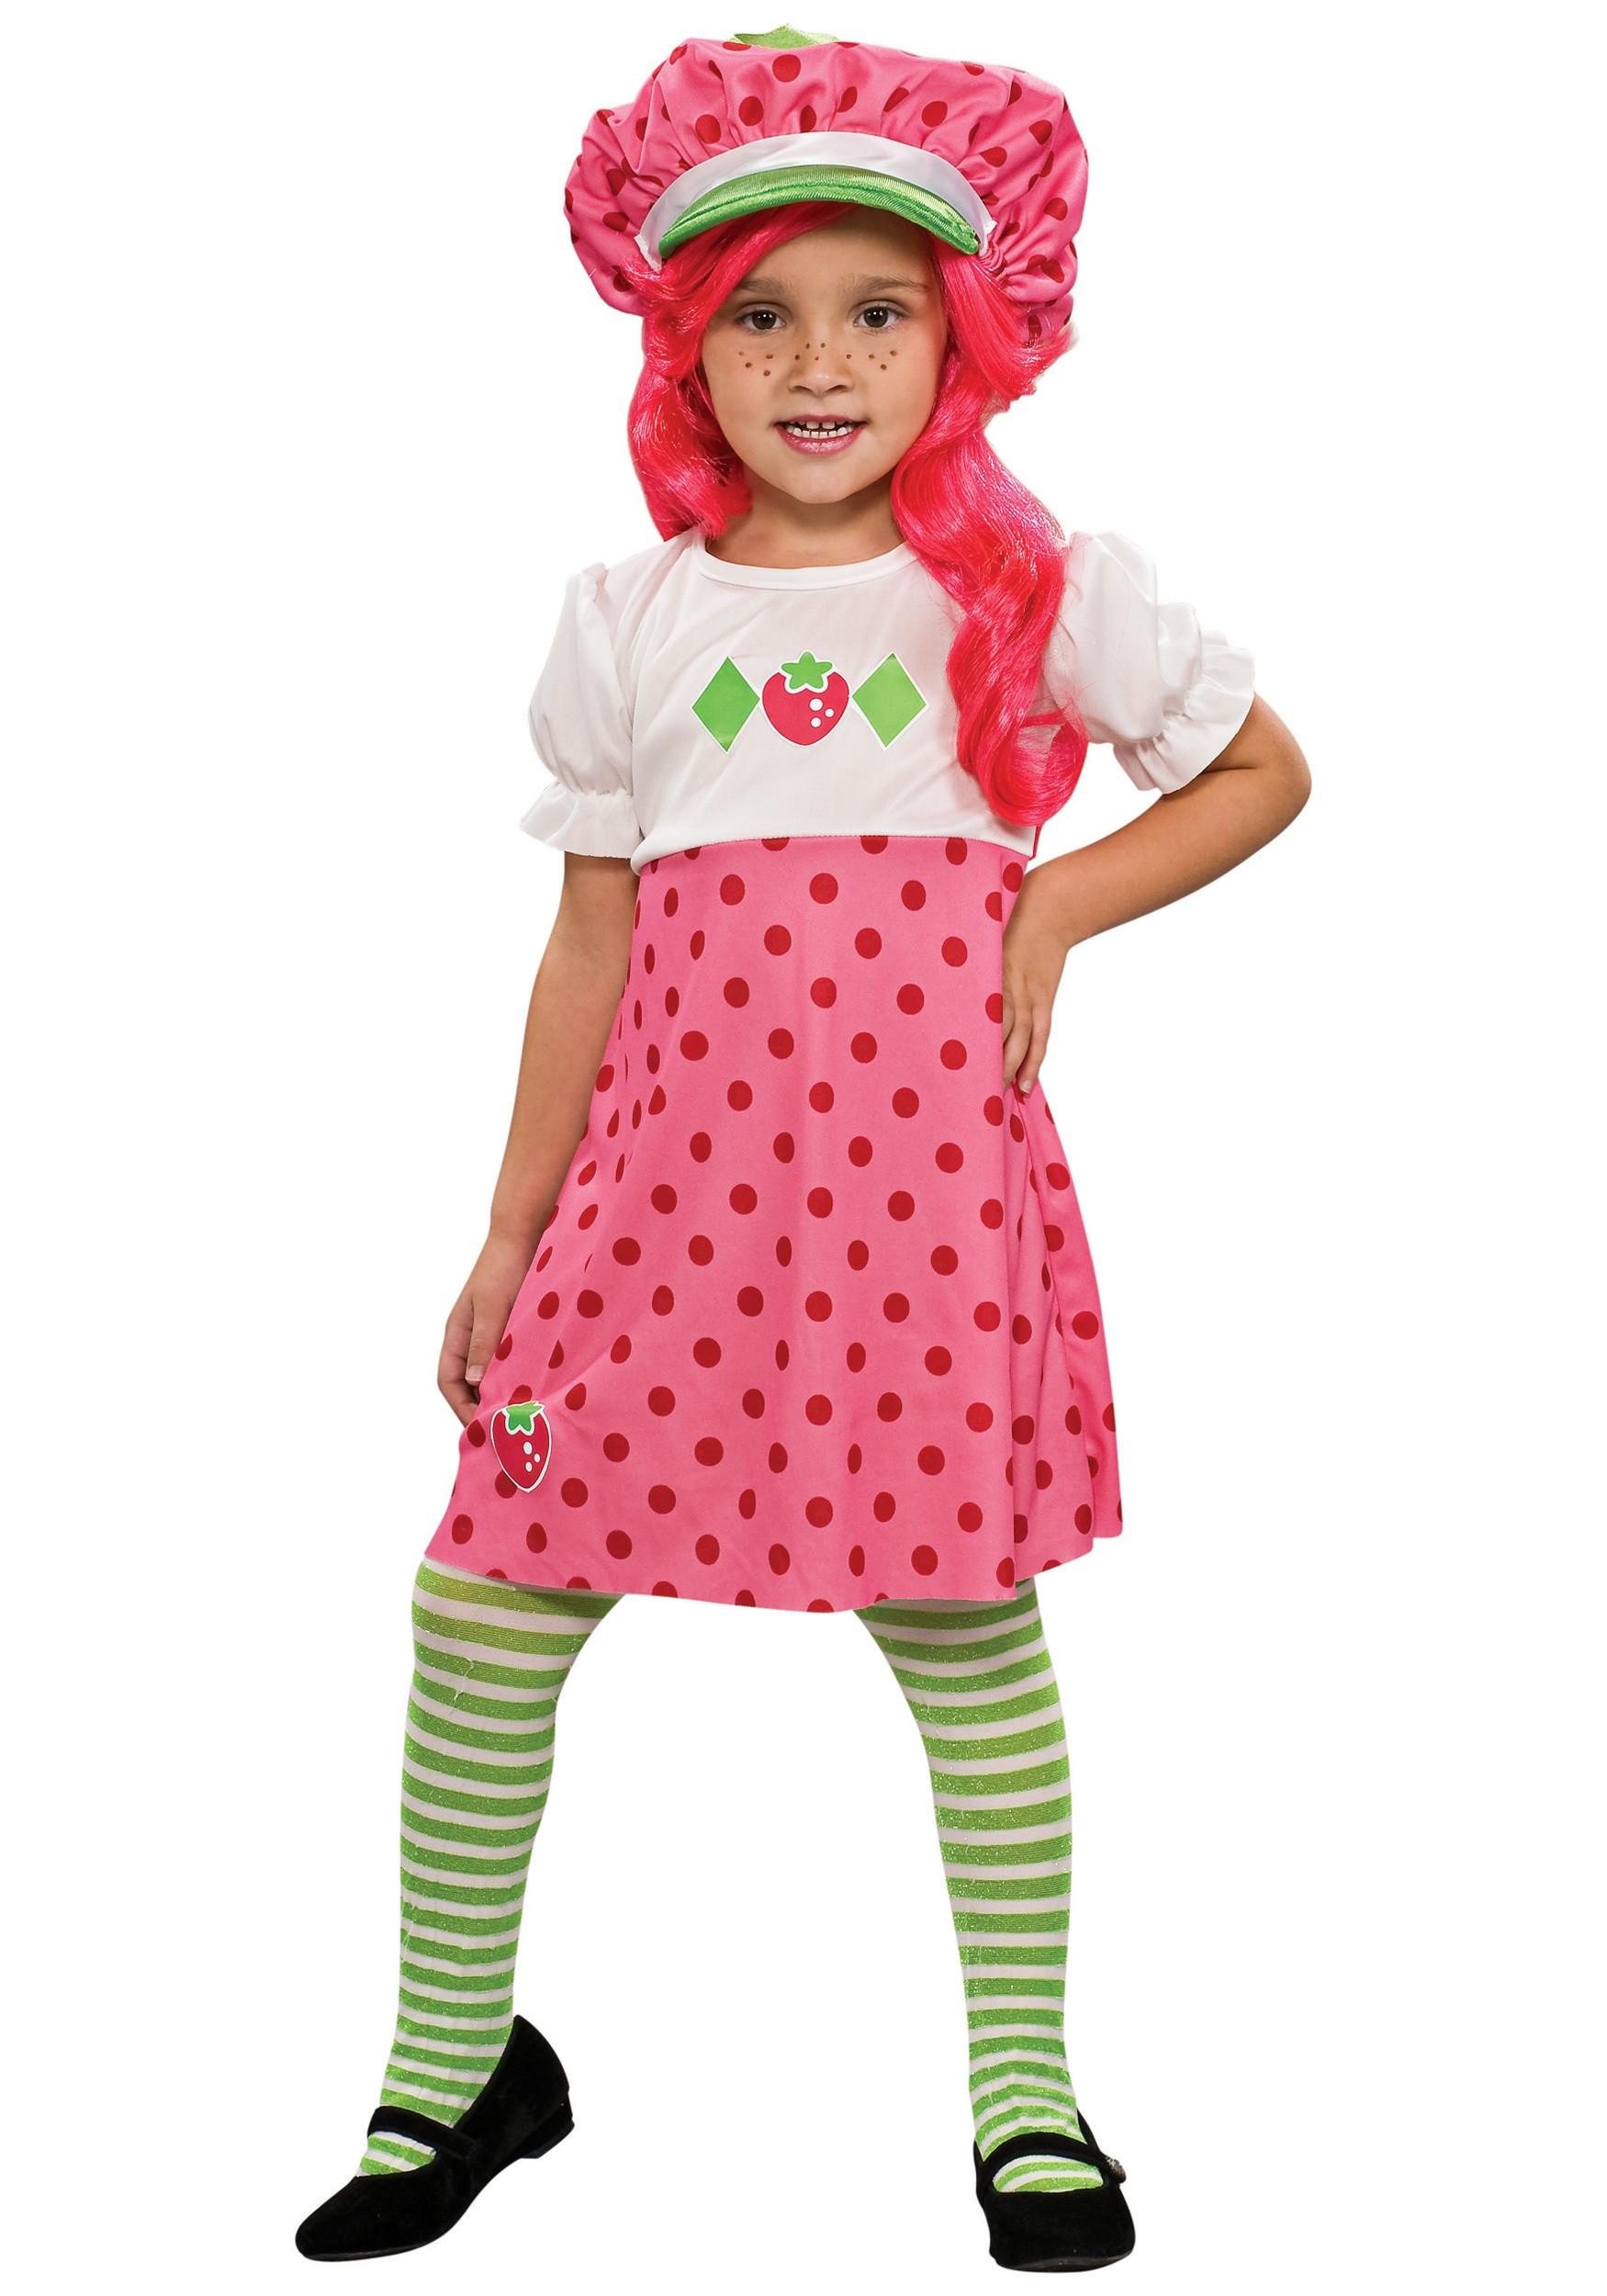 Strawberry Shortcake Haloween Costume  Toddler Strawberry Shortcake Costume